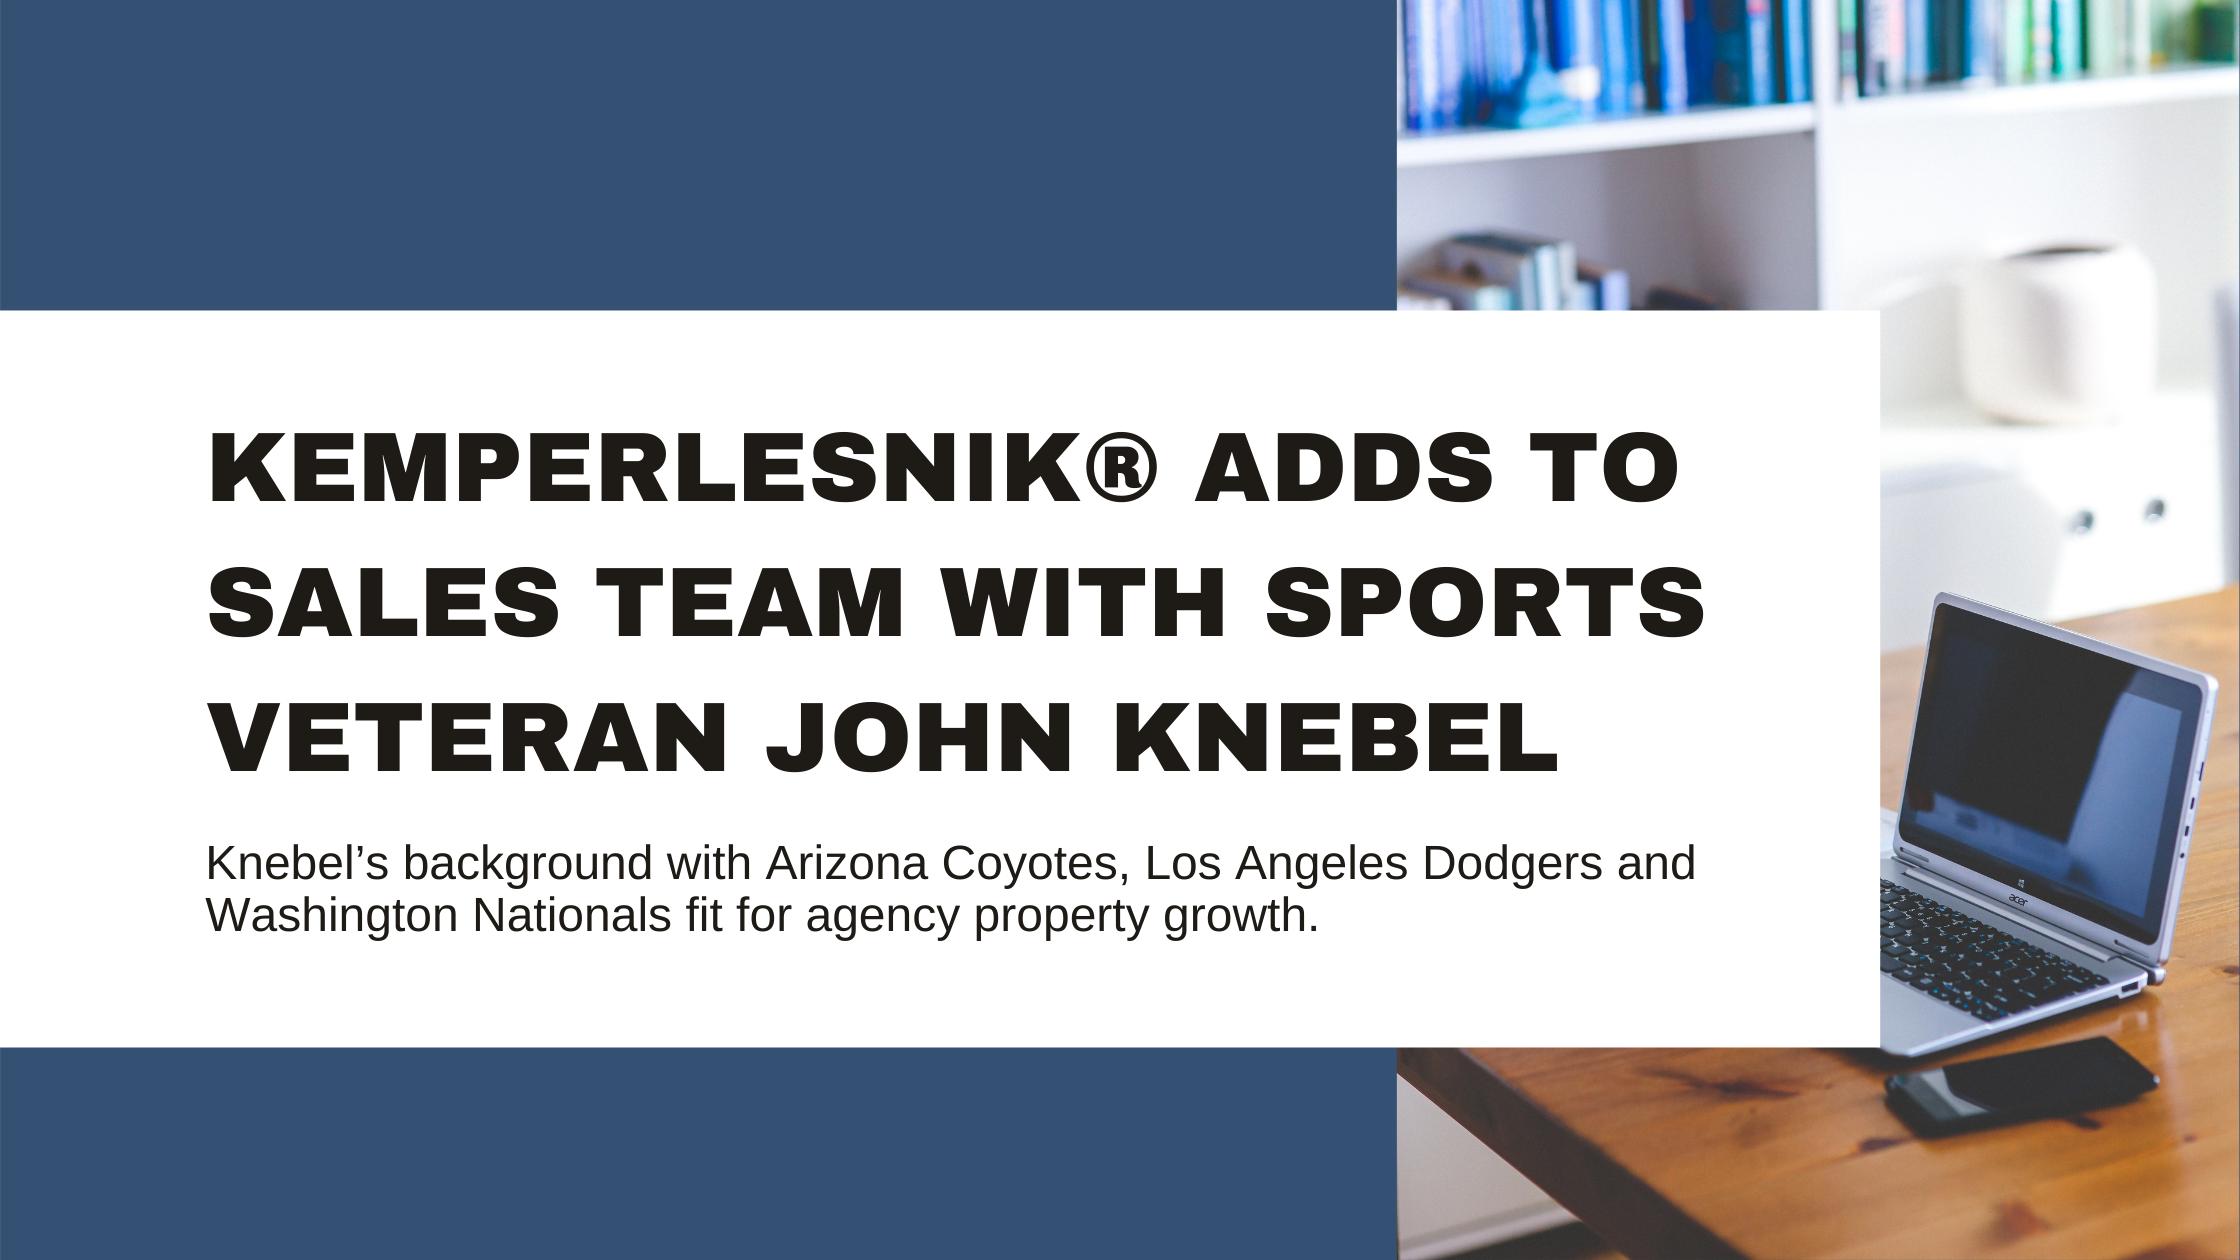 KemperLesnik Adds to Sales Team With Sports Veteran John Knebel